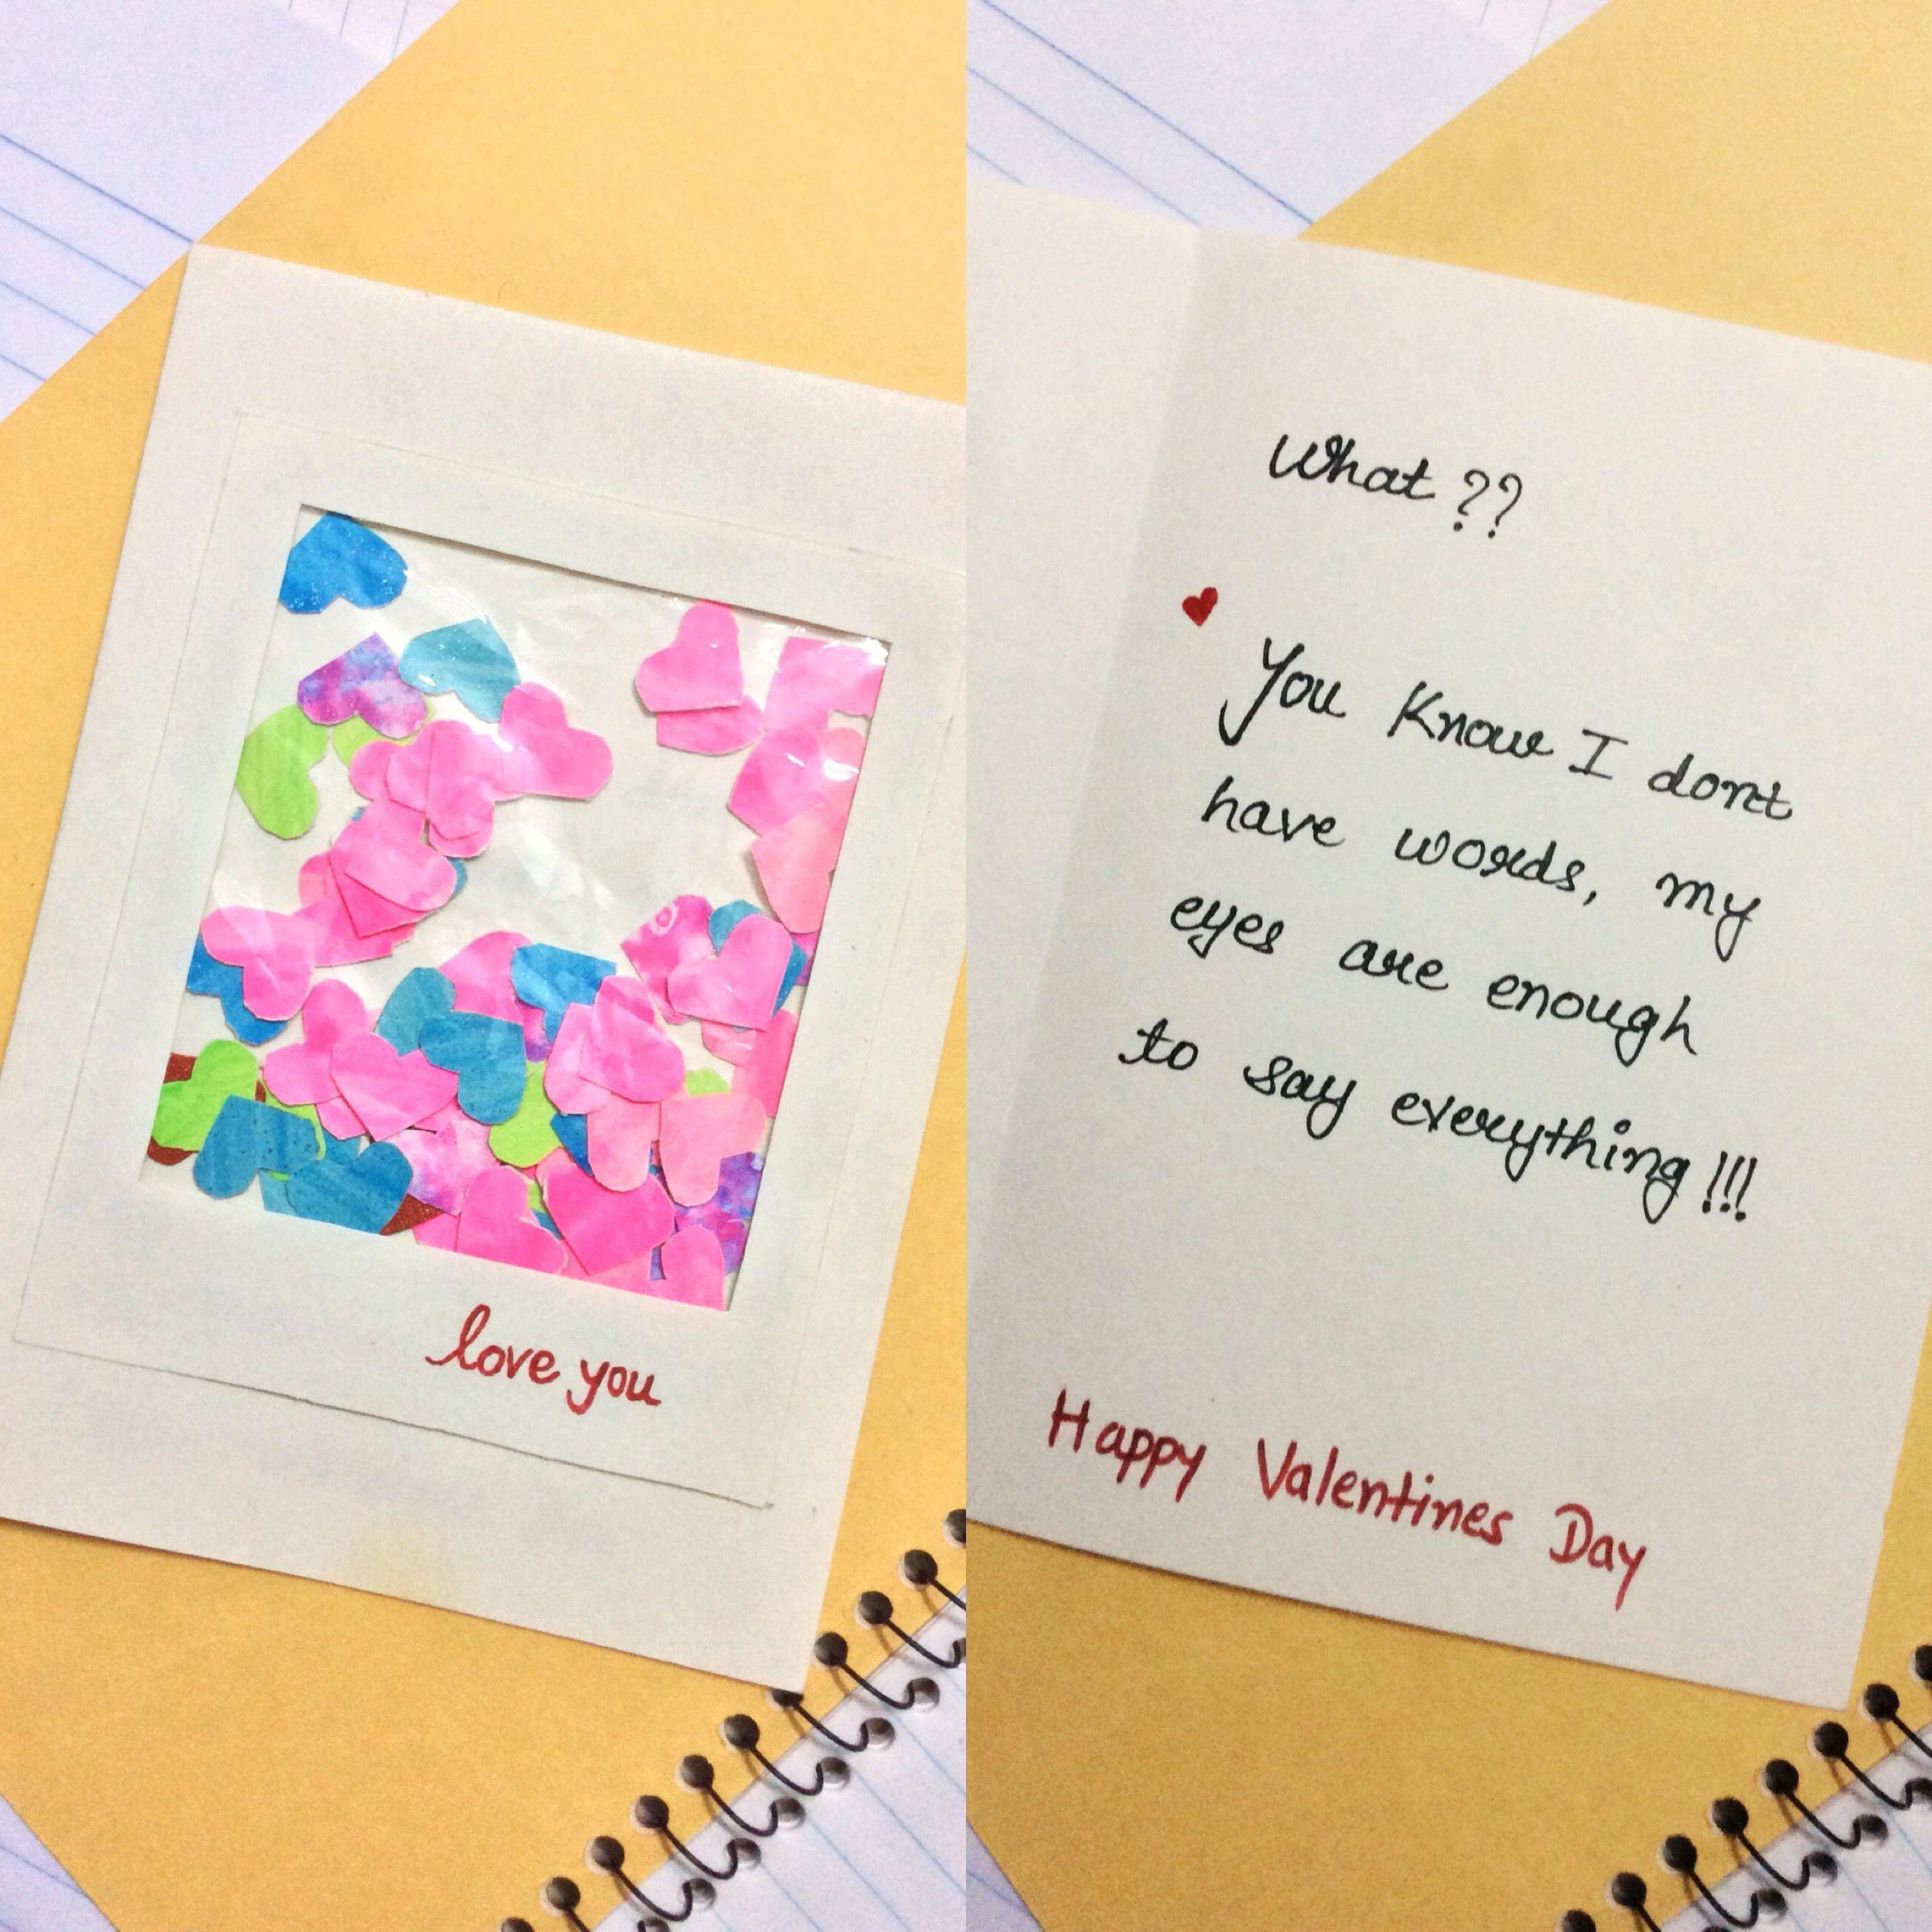 Valentines Day Card Valentine Day Weekly Cards Making Diy Crafts For Husband Wife Boyfriend Girlfriend Ha Cards Handmade Paper Crafts Diy Kids Valentines Cards